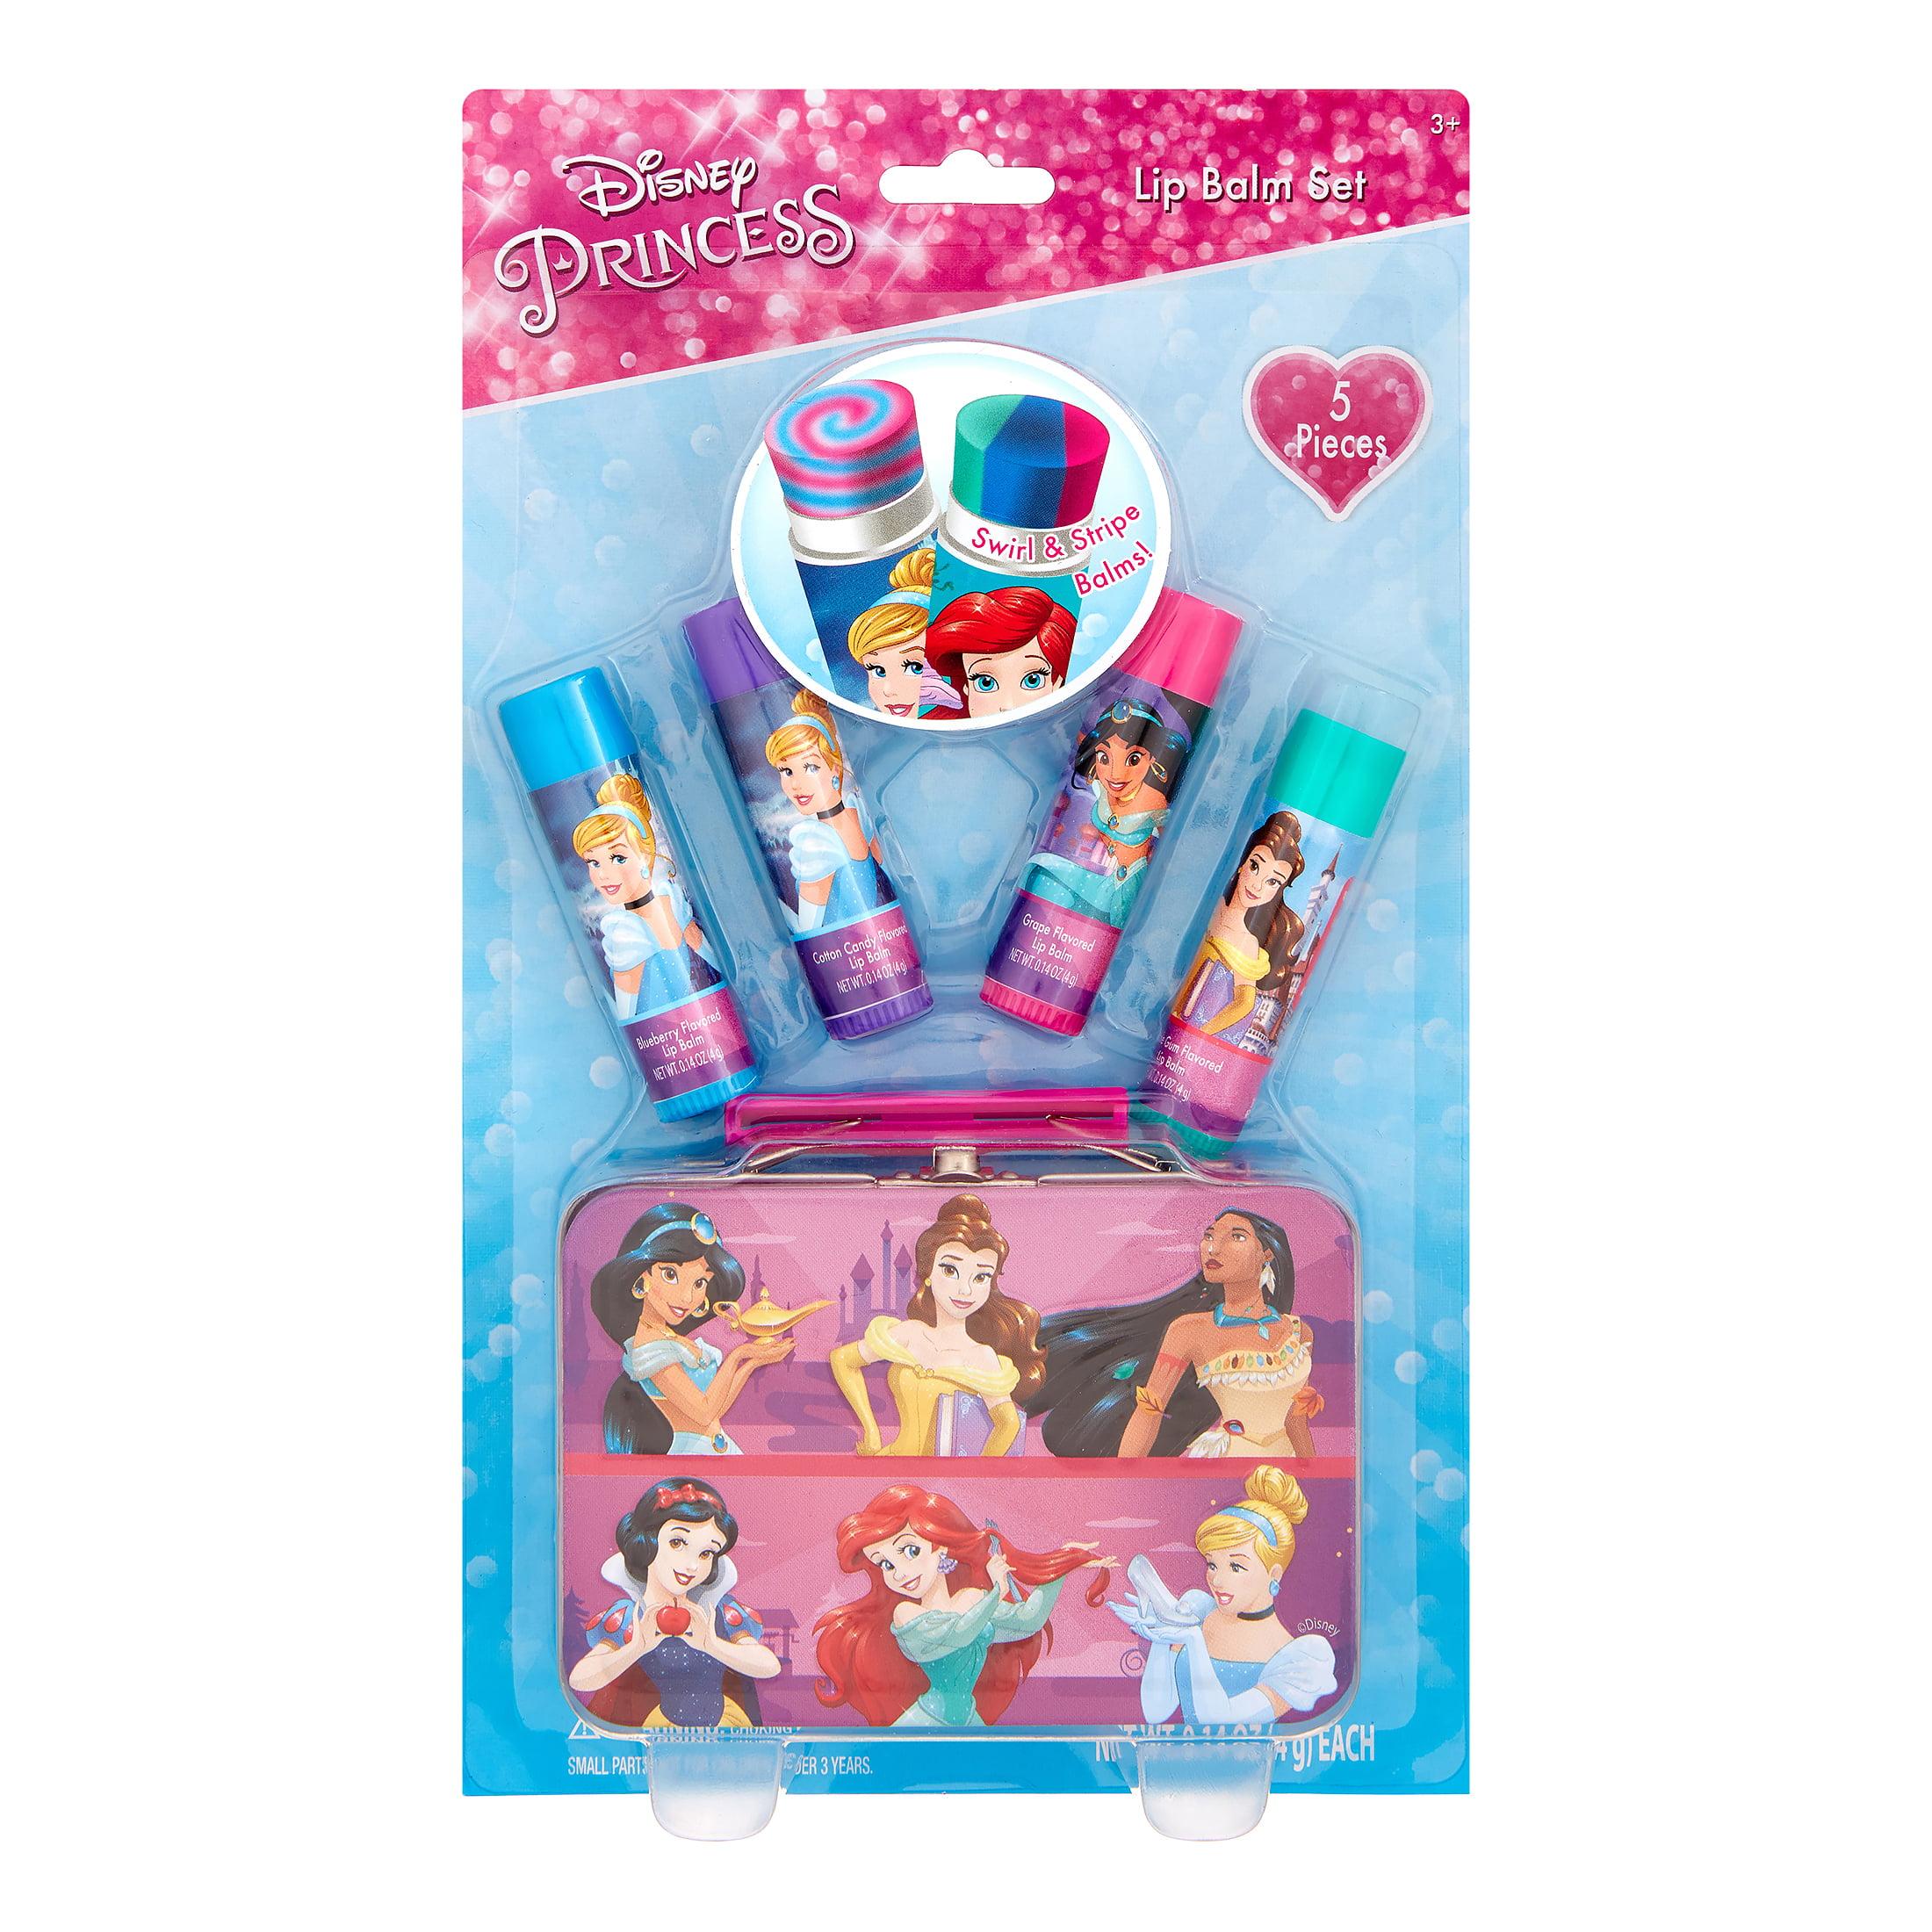 Disney Princess Lip Balm Gift Set with Metal Tin, 5 Pieces ($9.99 Value)